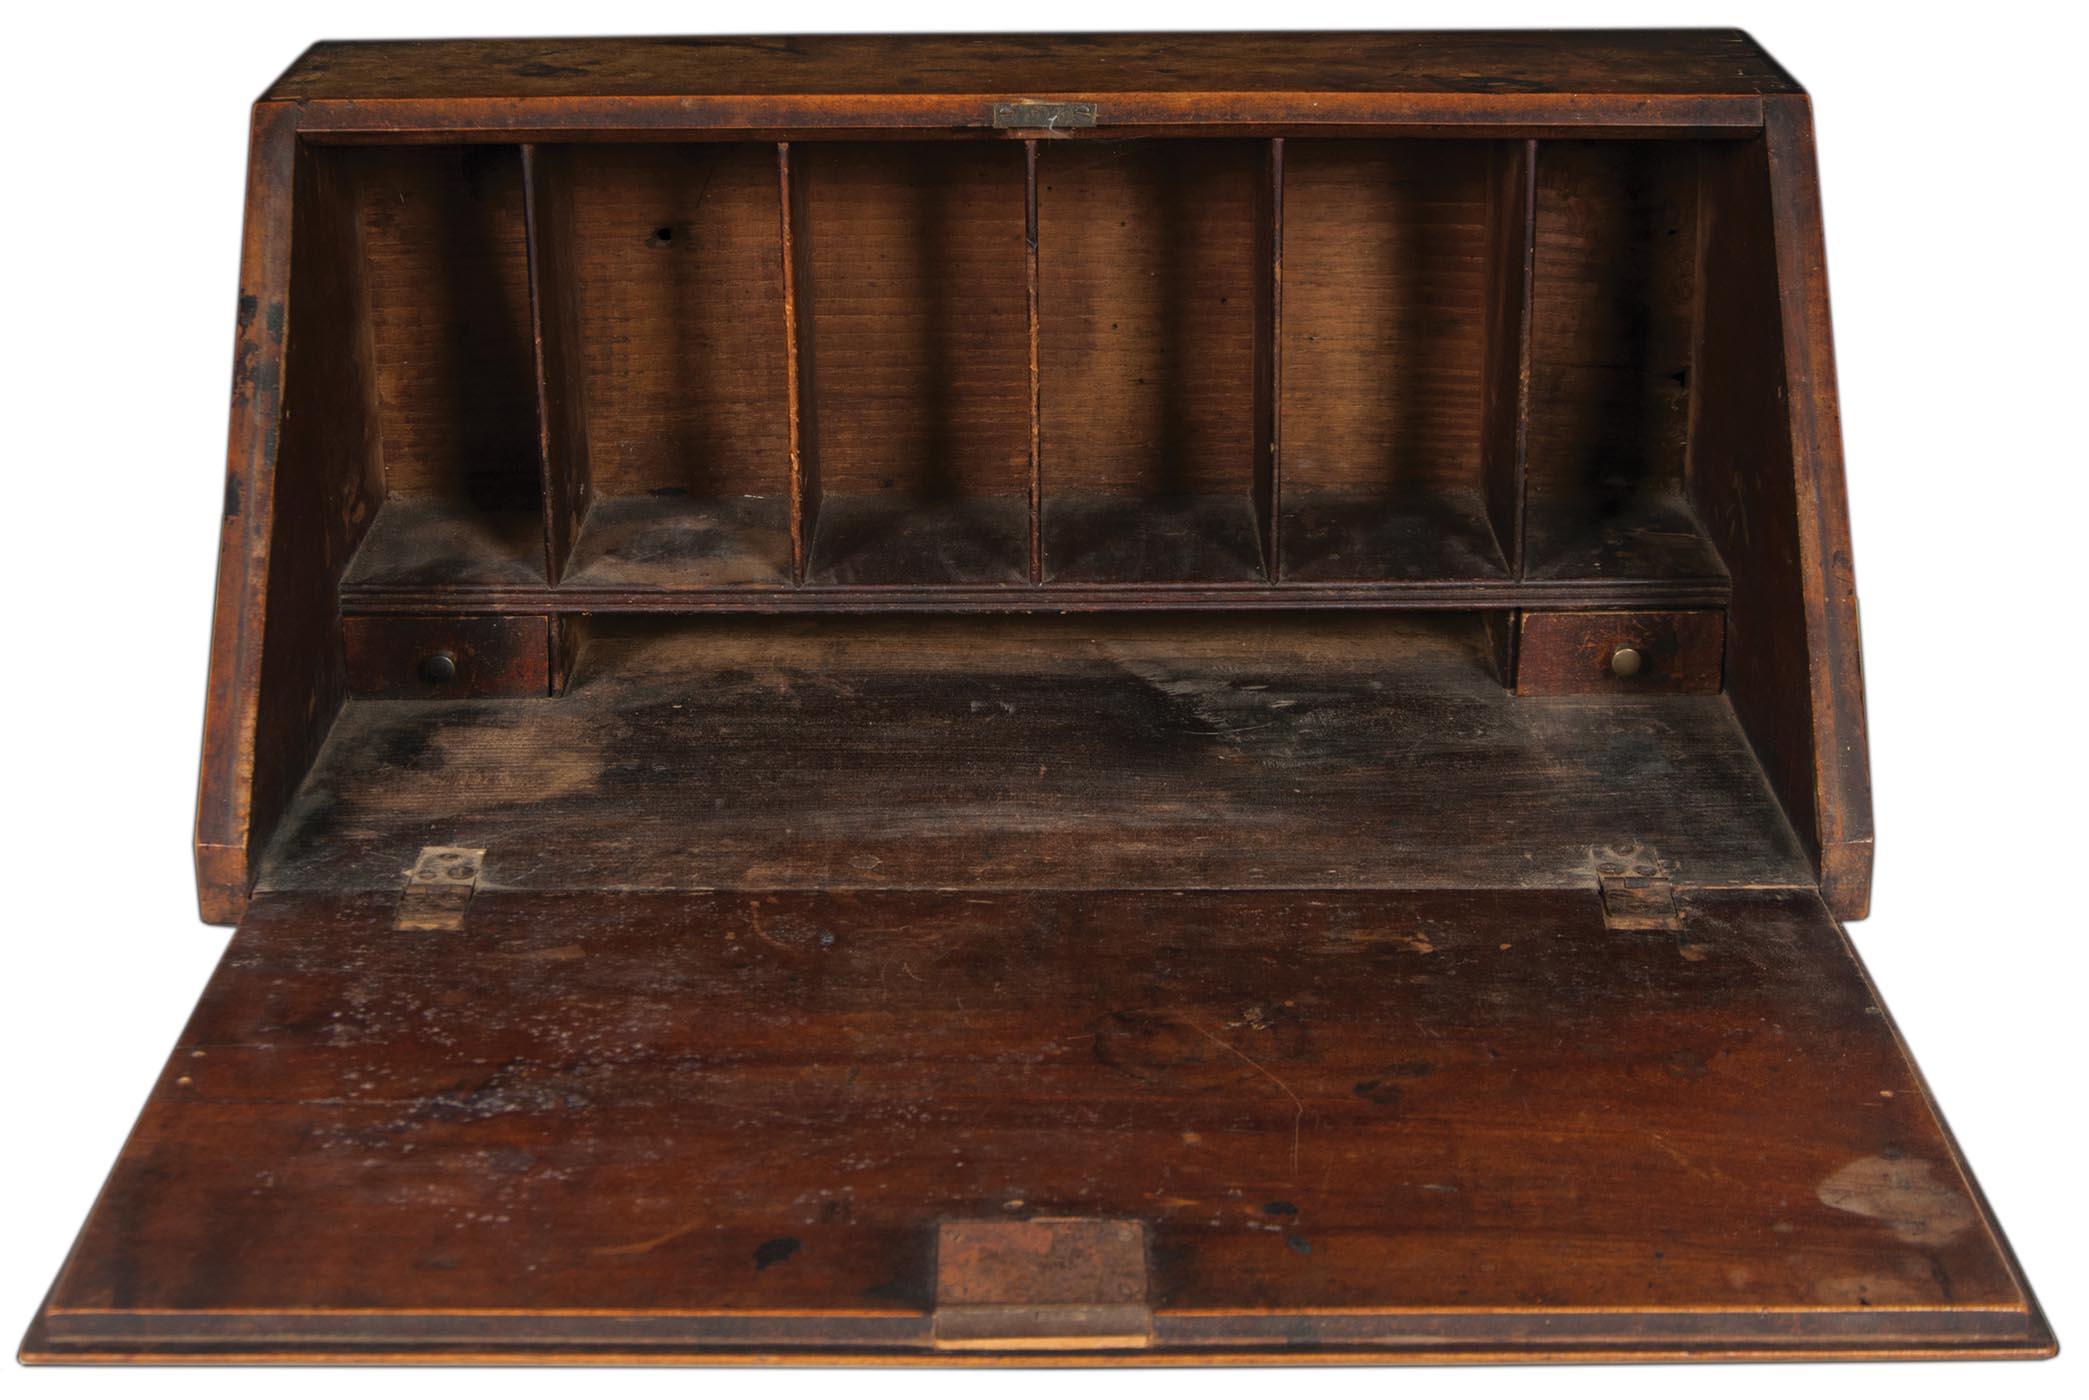 Captivating Slant Lid Table Top Desk | Willis Henry Auctions, Inc.